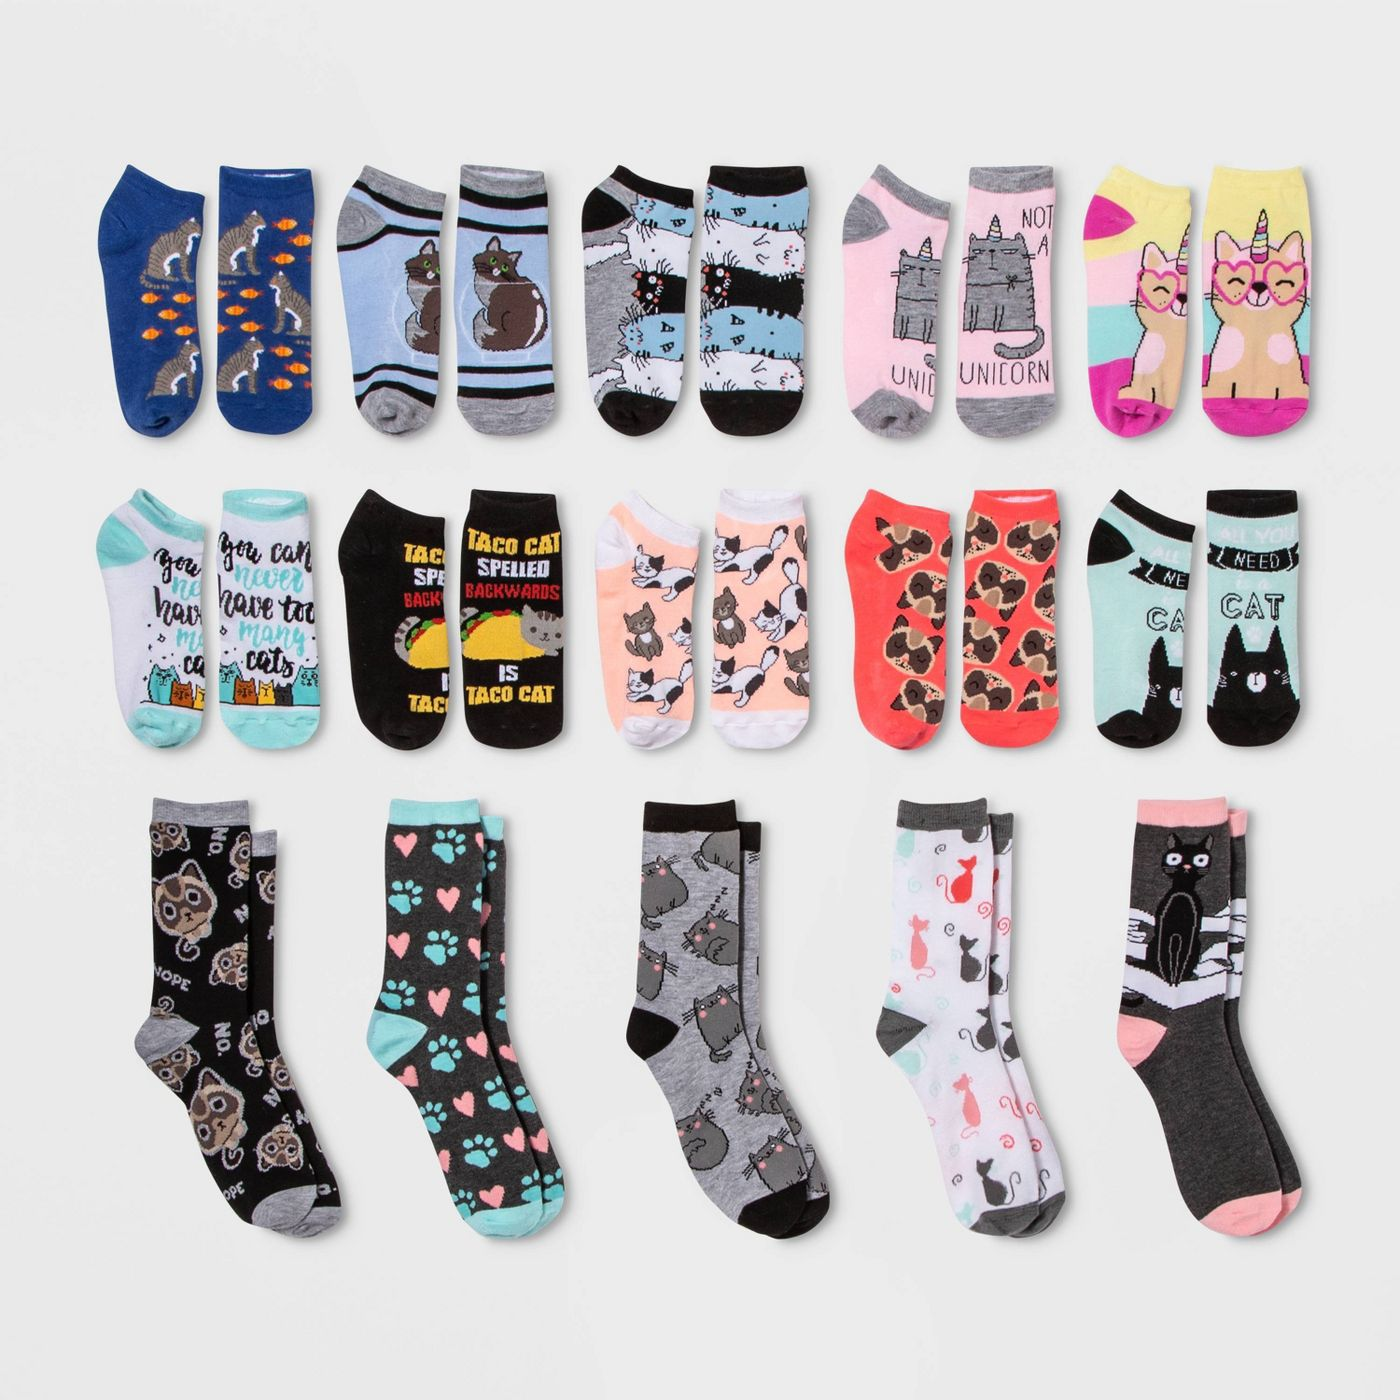 Hyp Women's Cat Lovers 15 Days of Socks Advent Calendar